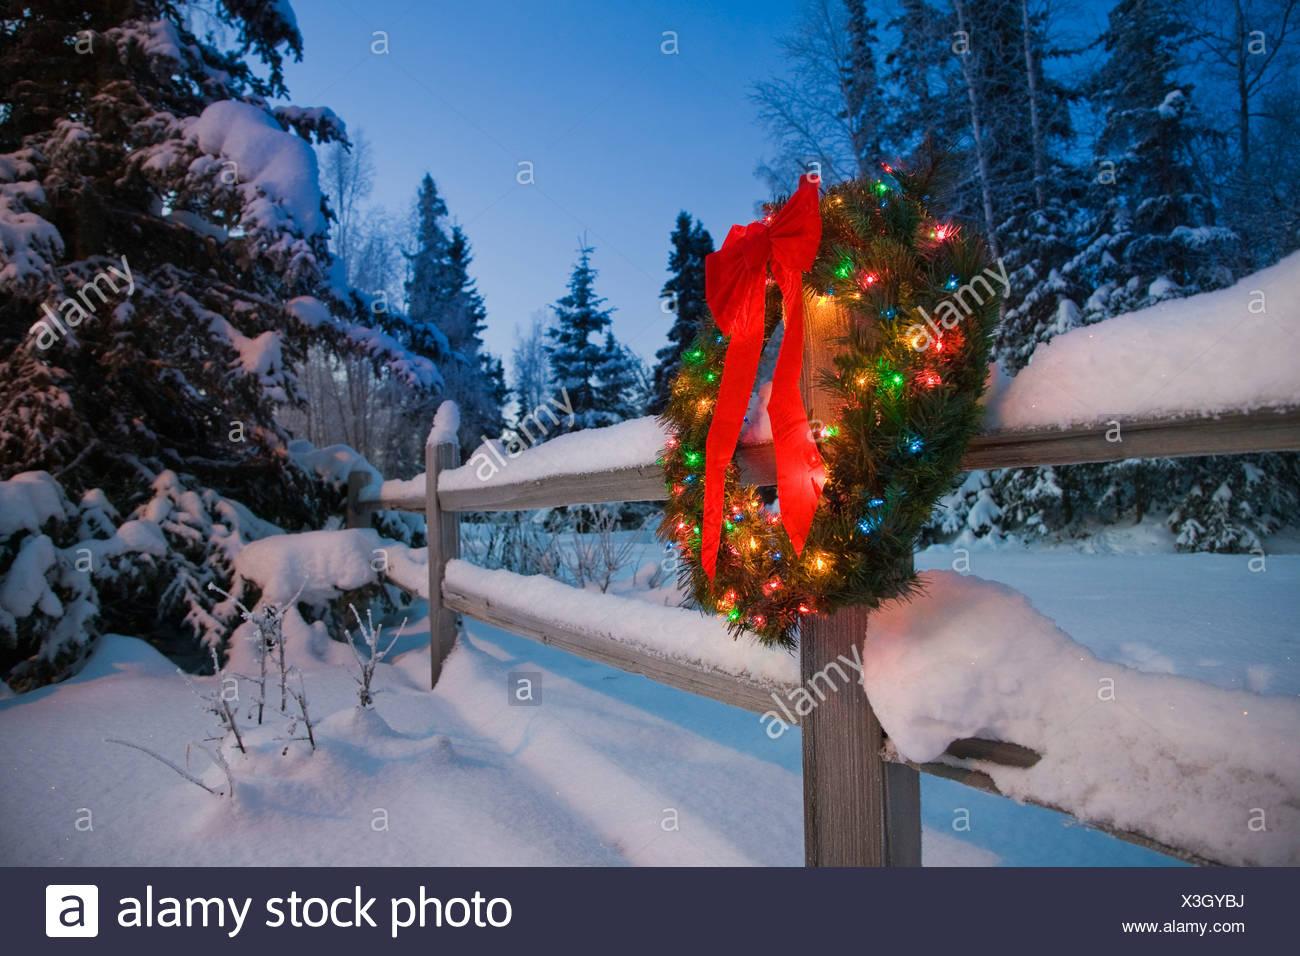 Decorated Christmas wreath hangs on a snowcovered split rail fence at dusk, Alaska Stock Photo